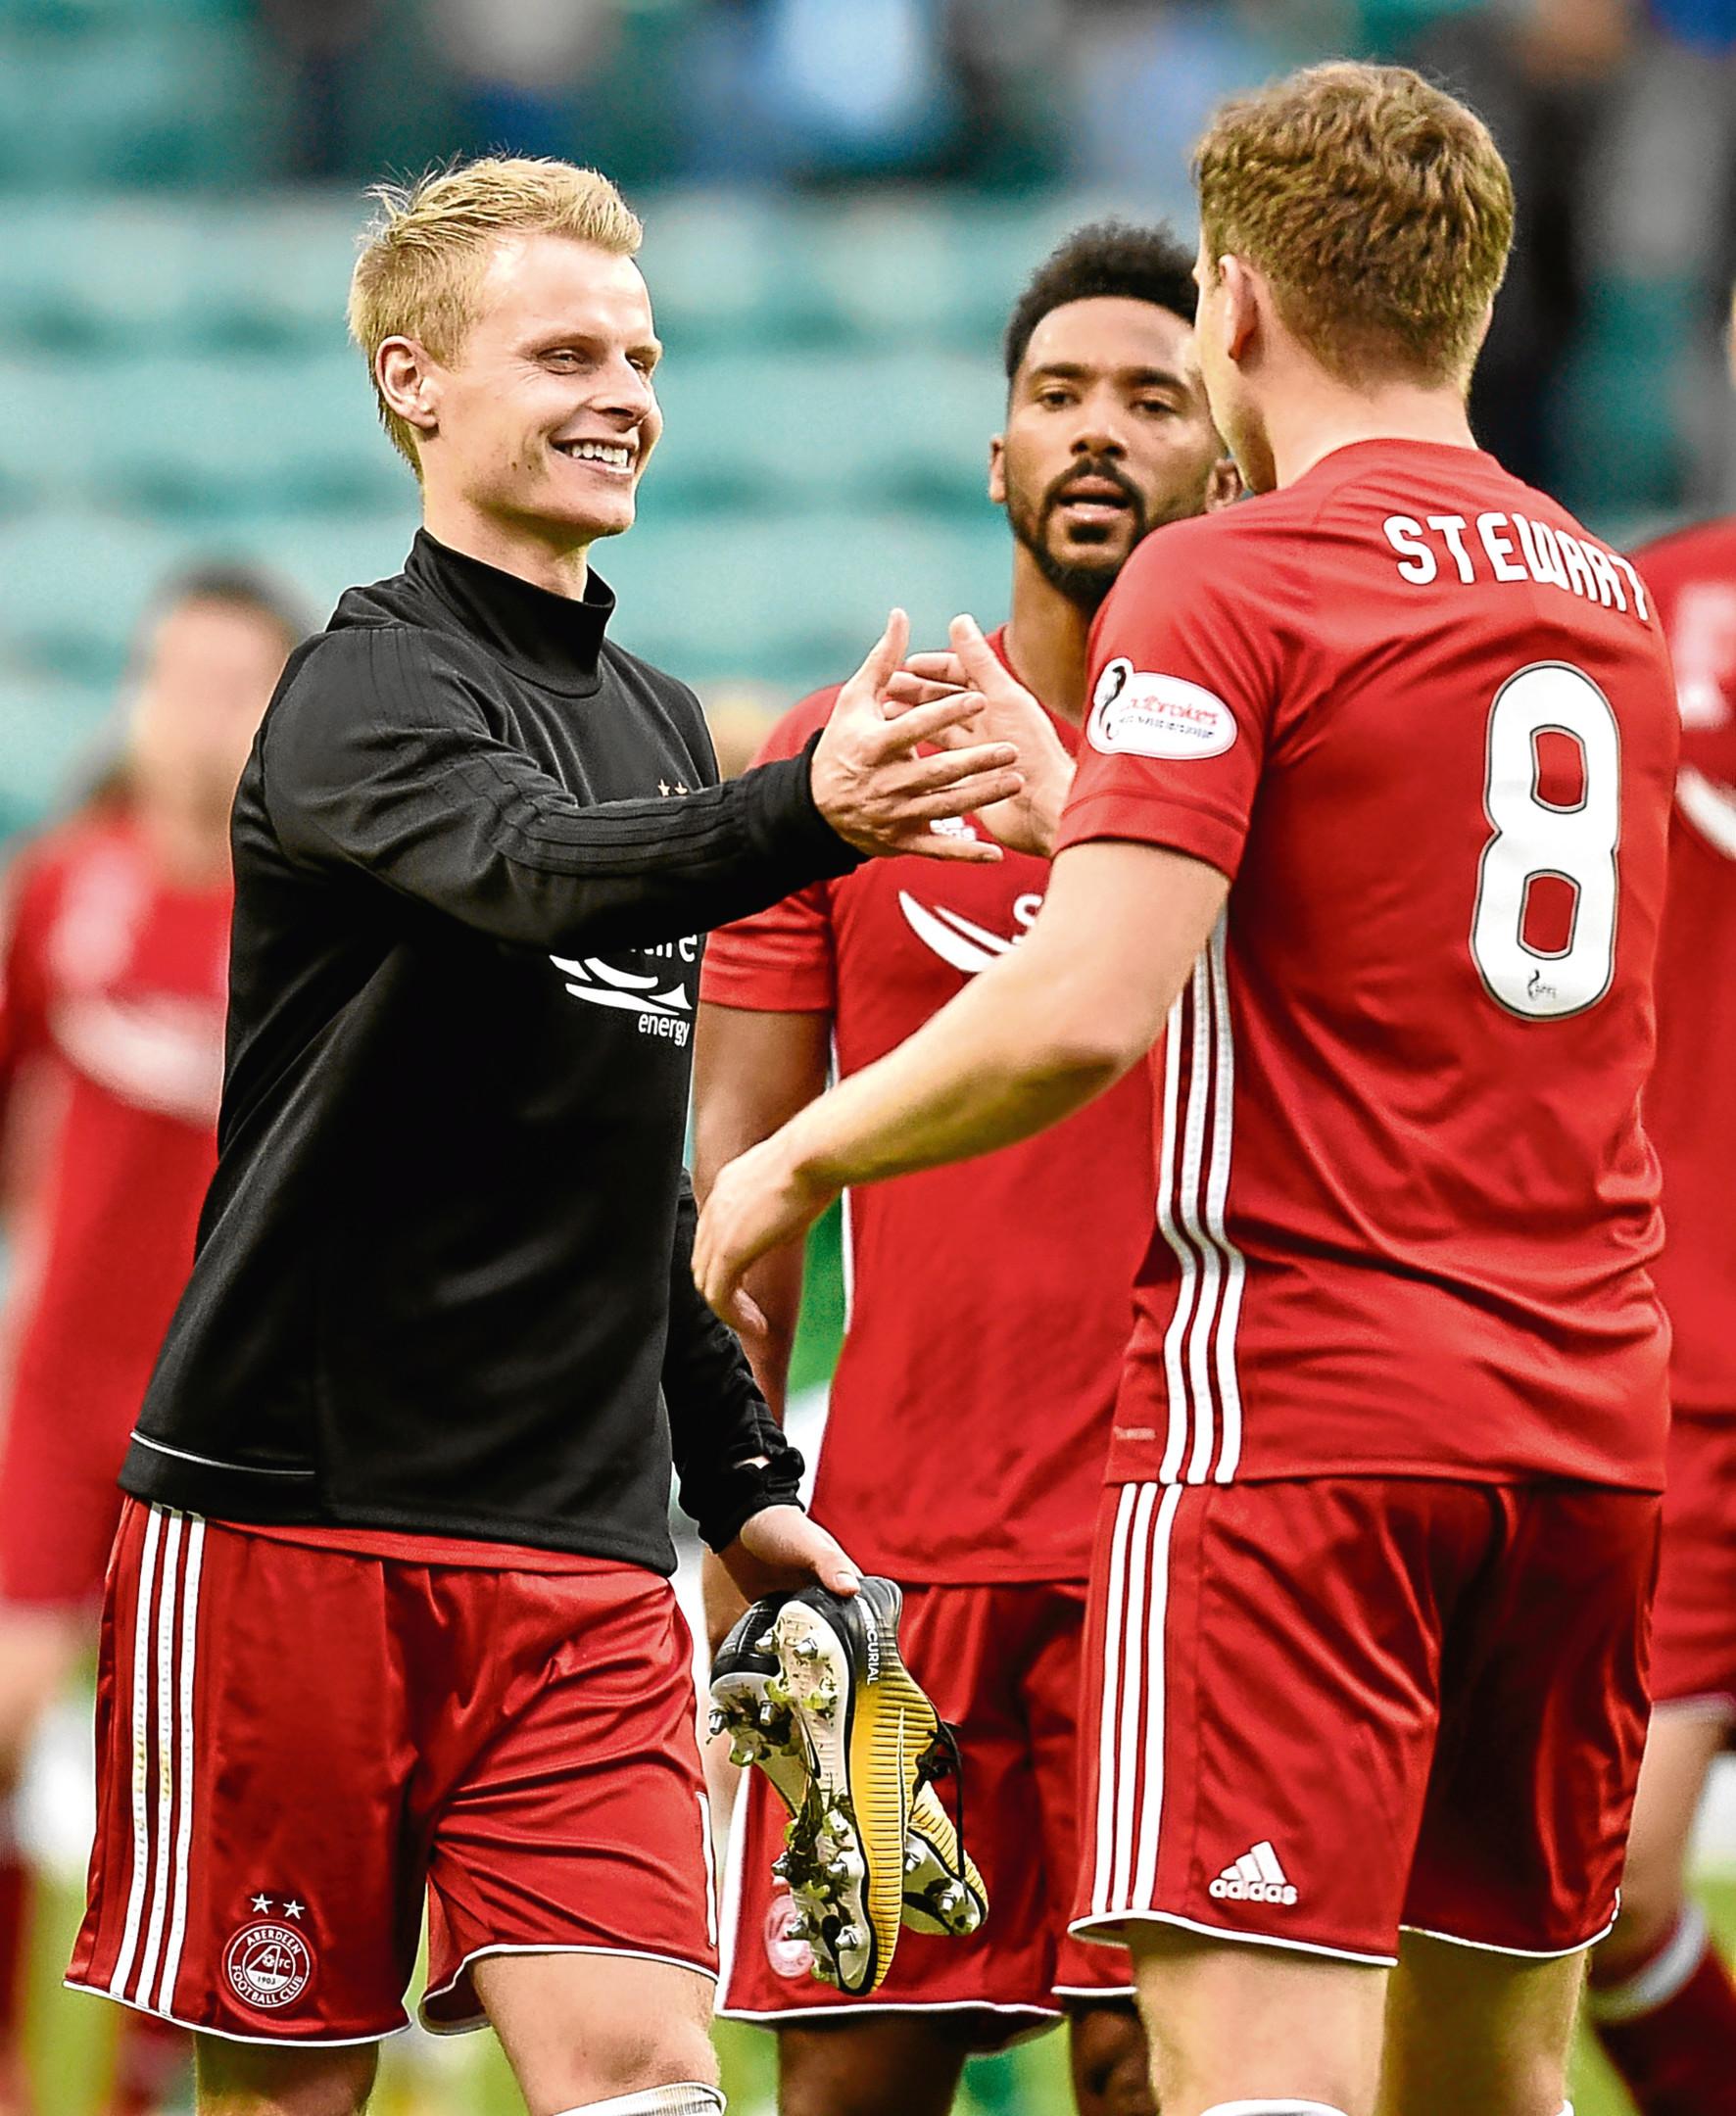 Aberdeen's Gary Mackay-Steven and Greg Stewart at full-time against Hibs.